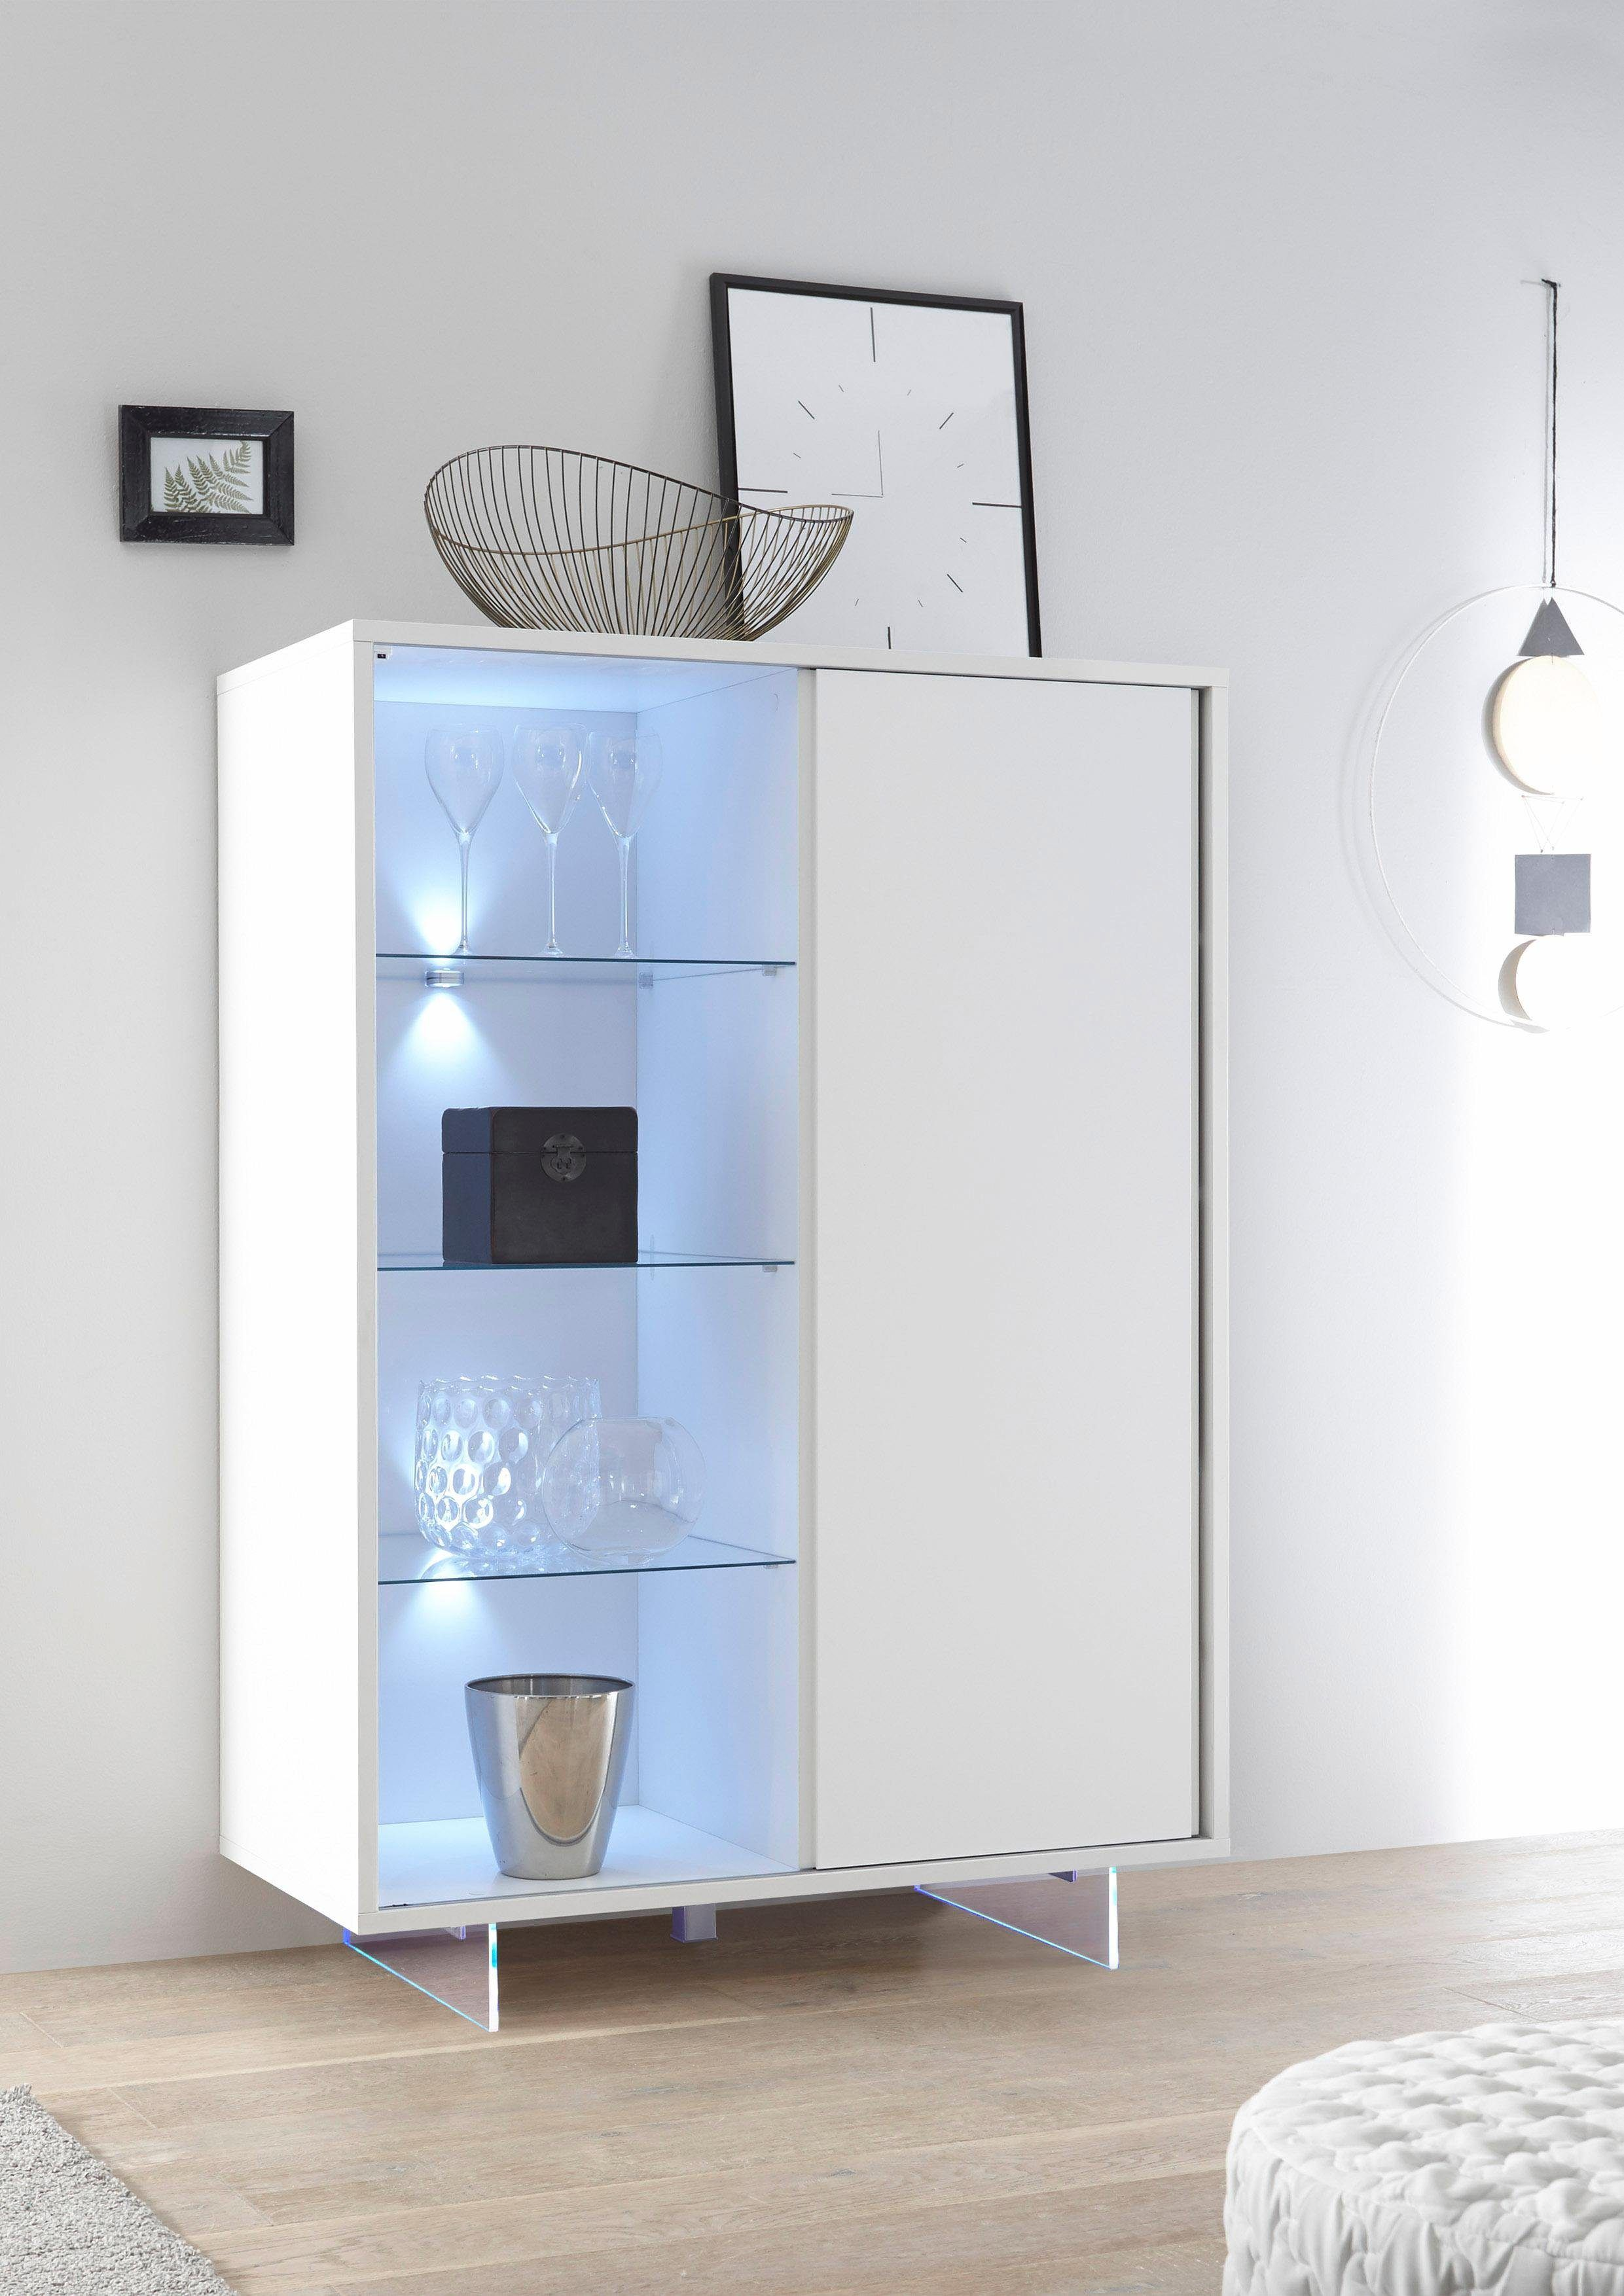 32 Wohnzimmer Kommode Ikea | Haus Ideen - Part 7